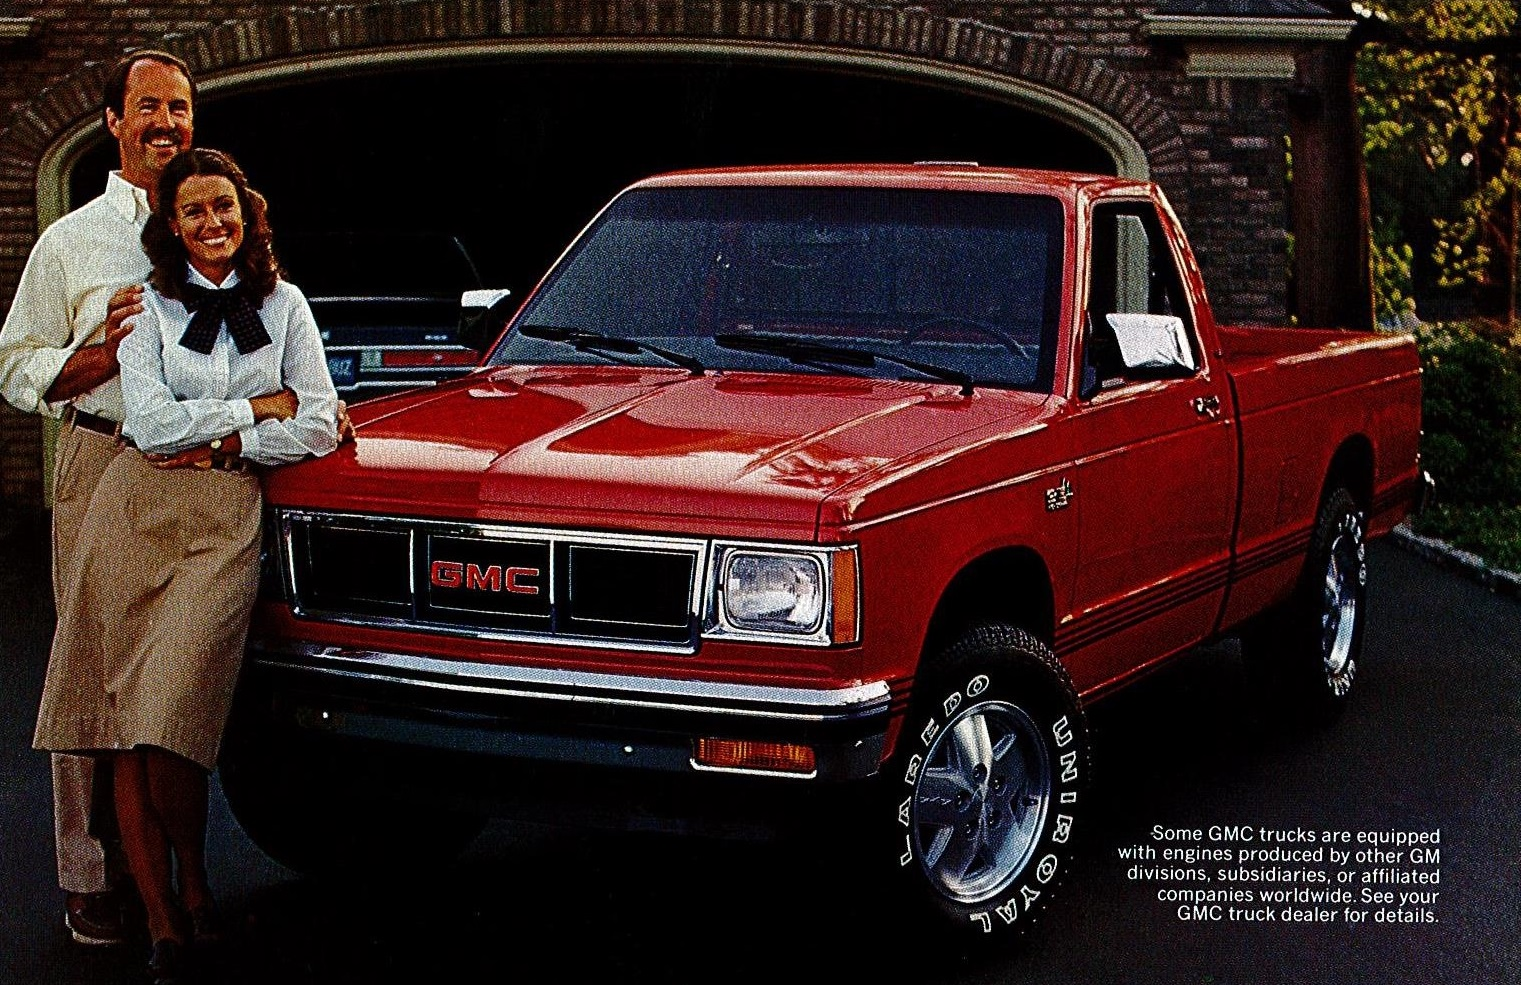 Gmc on 1991 Dodge Daytona